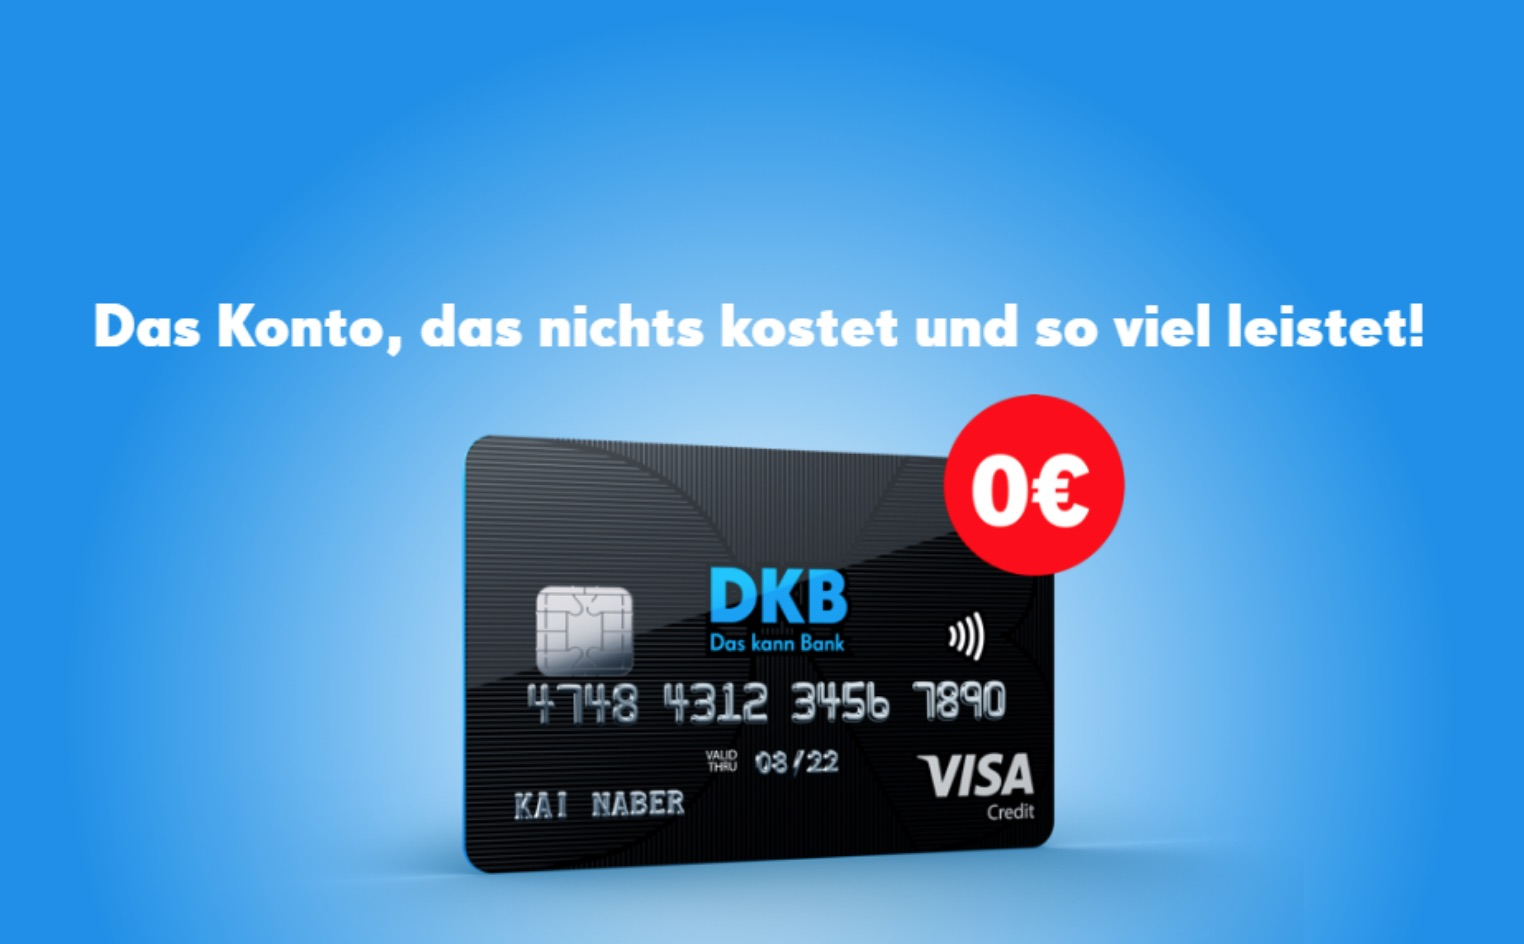 Kostenloses Konto DKB-Cash-Girokonto Deutsche Kreditbank